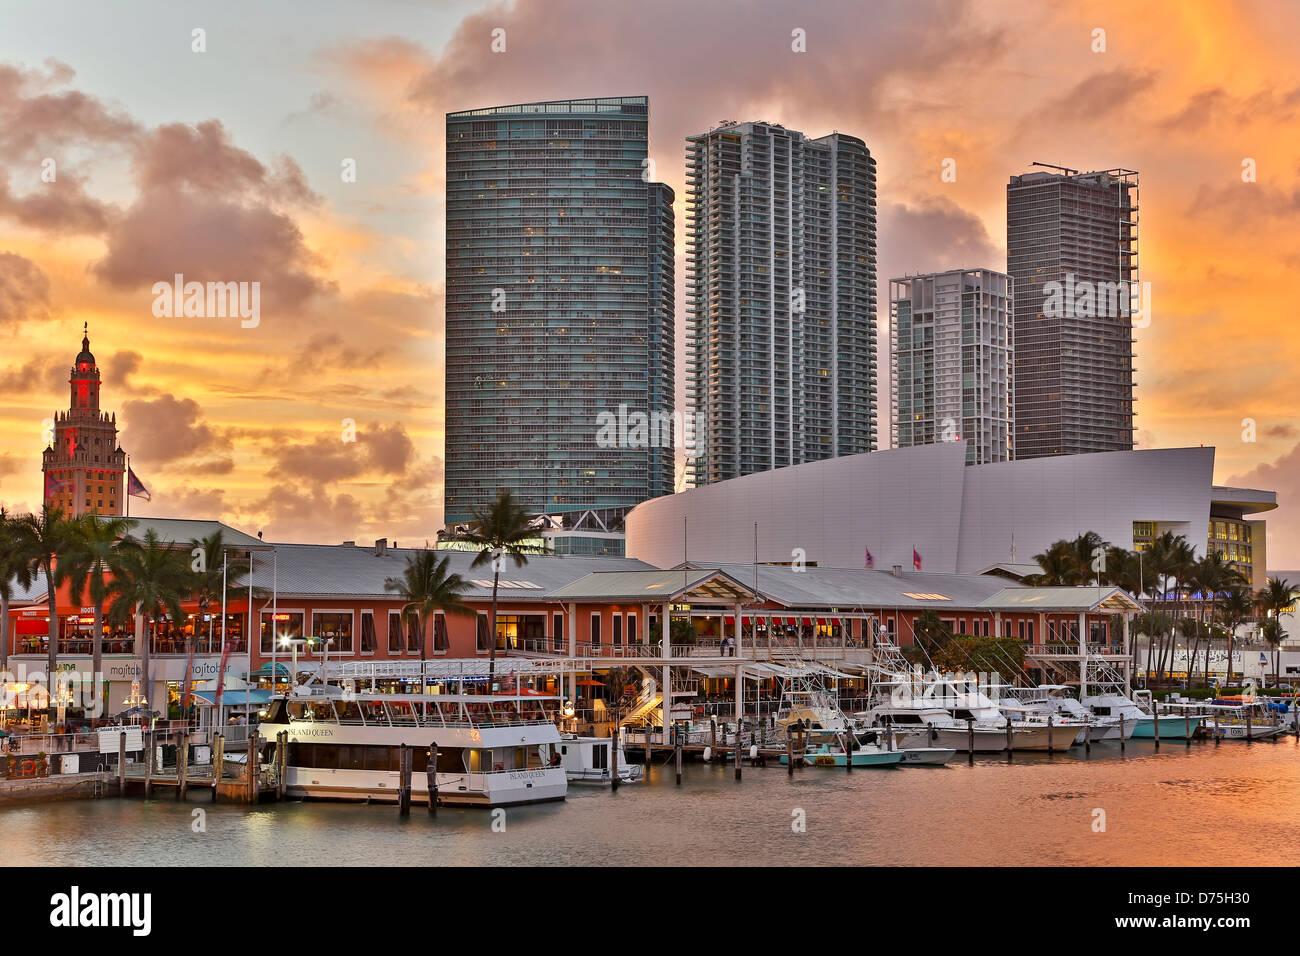 Marina am Bayfront Marketplace und Wolkenkratzer, Miami, Florida USA Stockbild